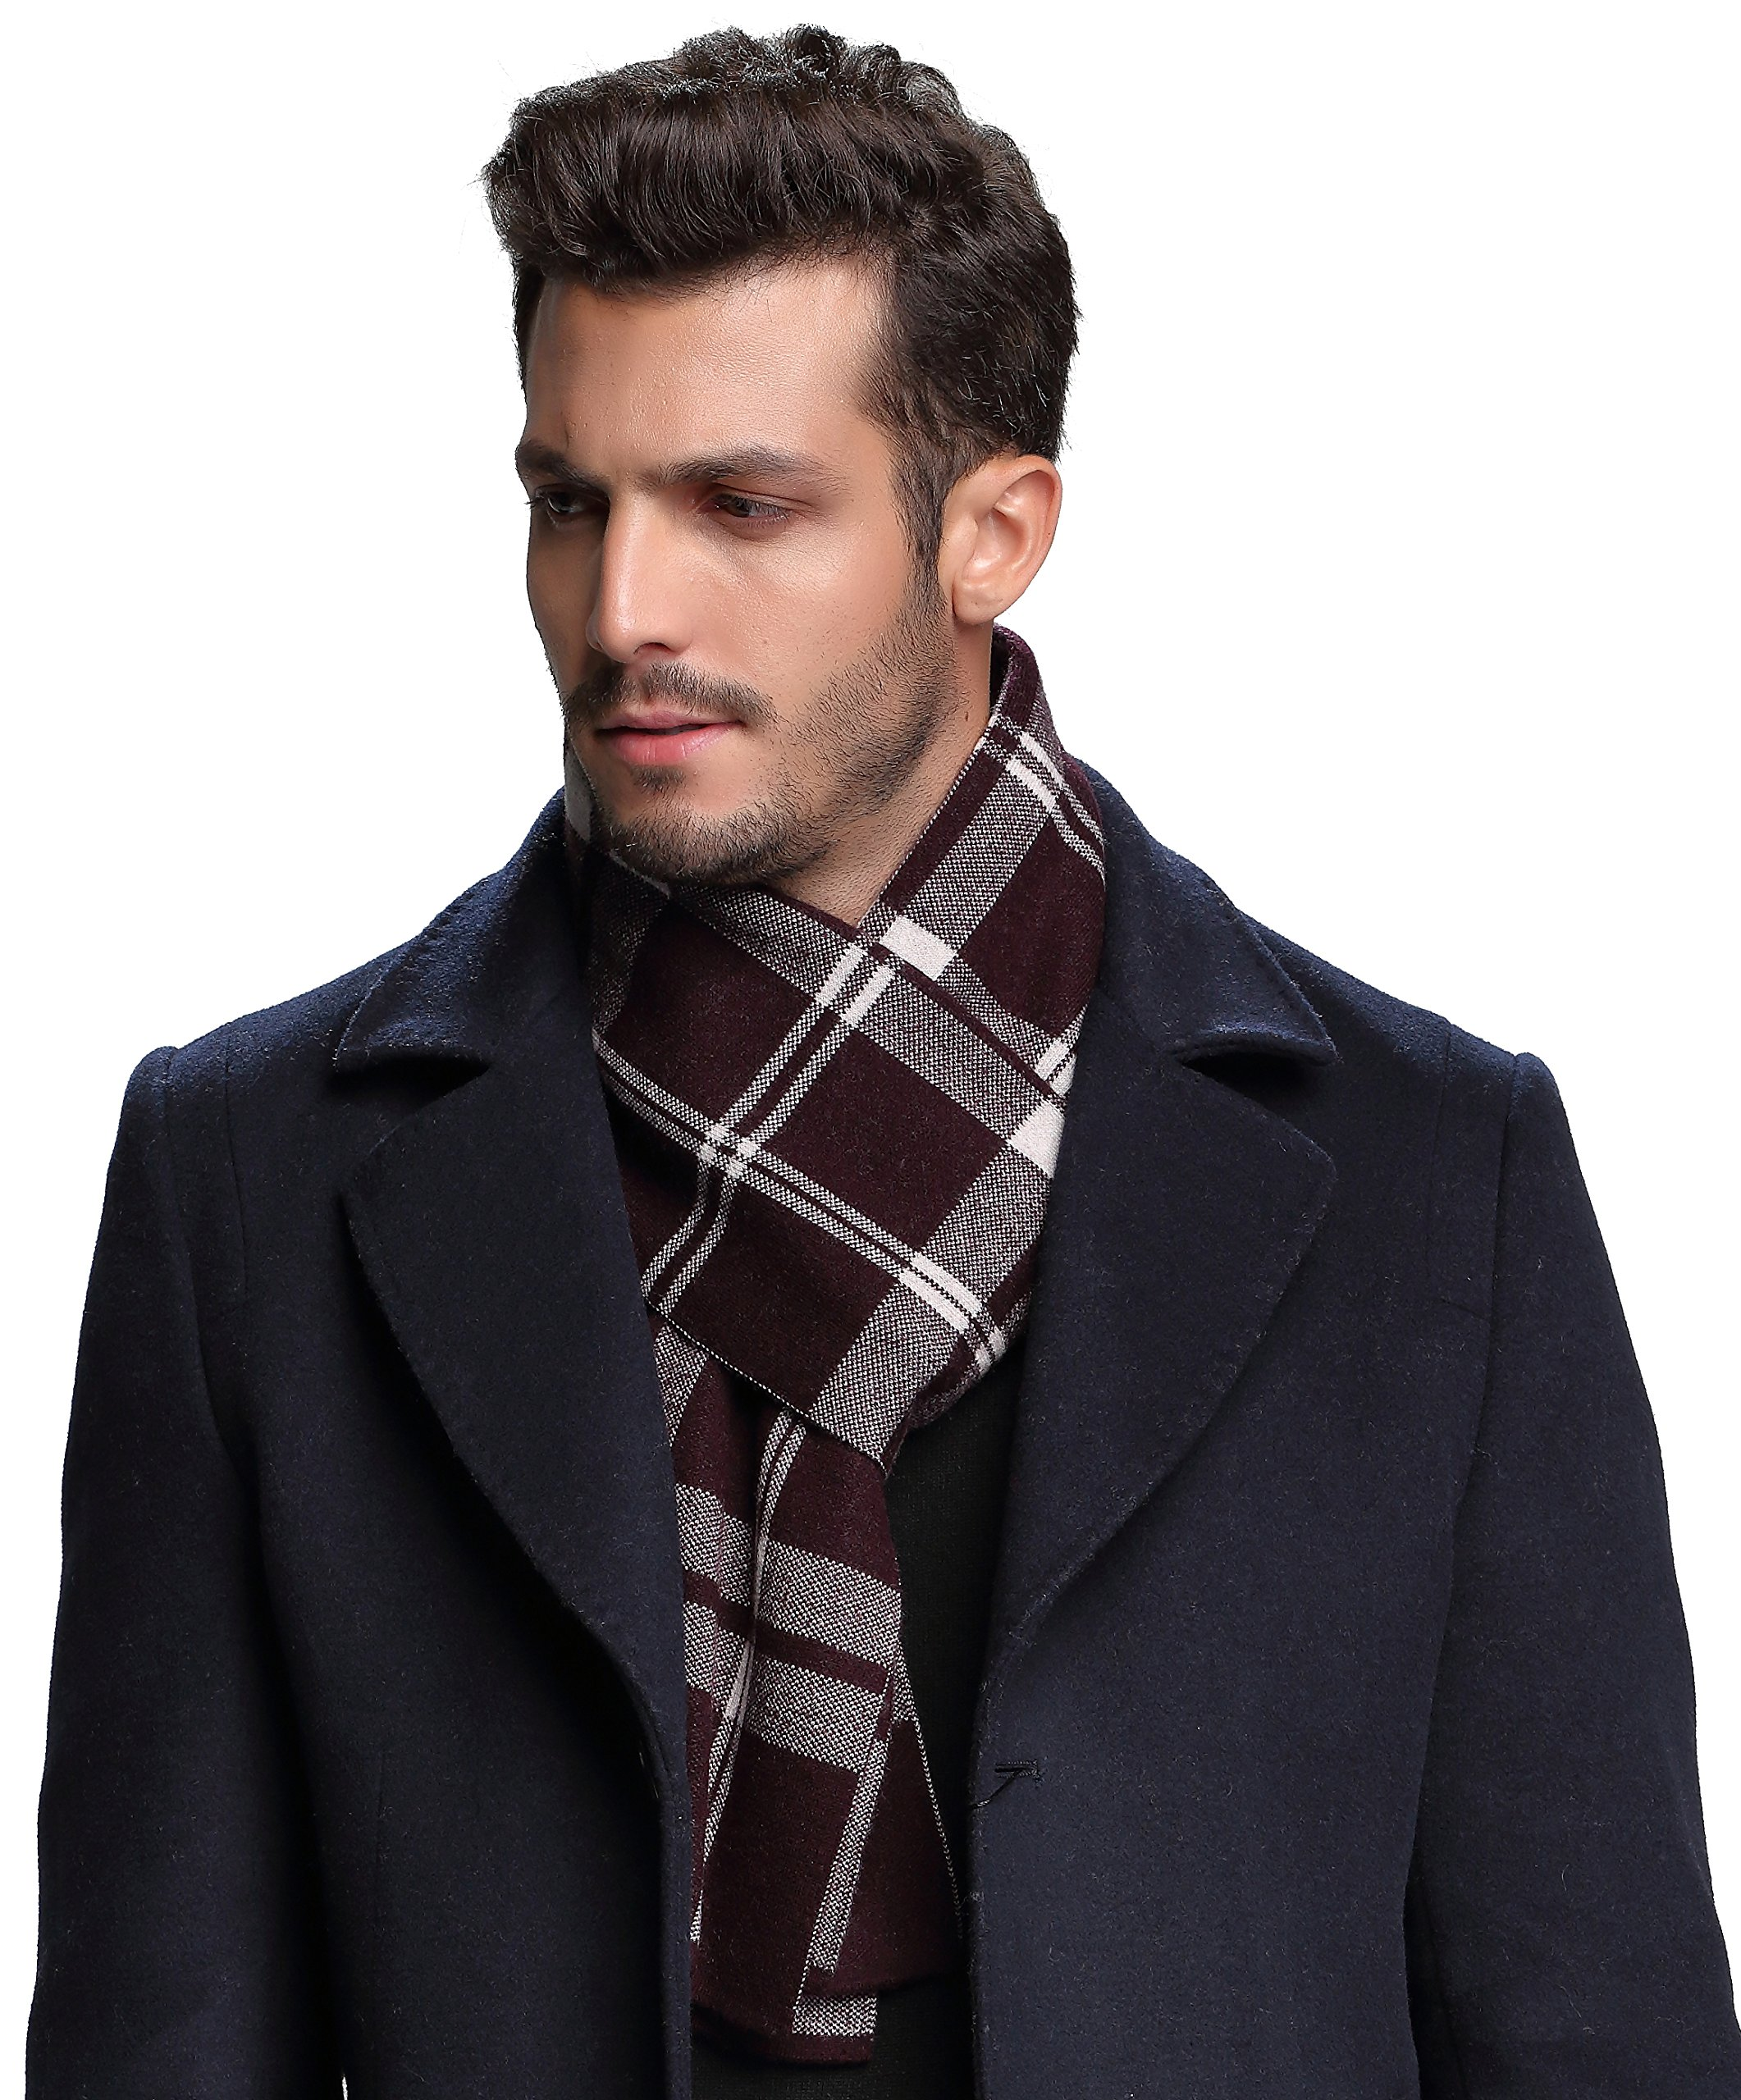 Ellettee, 100% Australian Wool Men Scarf Classic Knitted Long NeckwearStripe Plaid Scarves (Plaid CoffeeWhite)